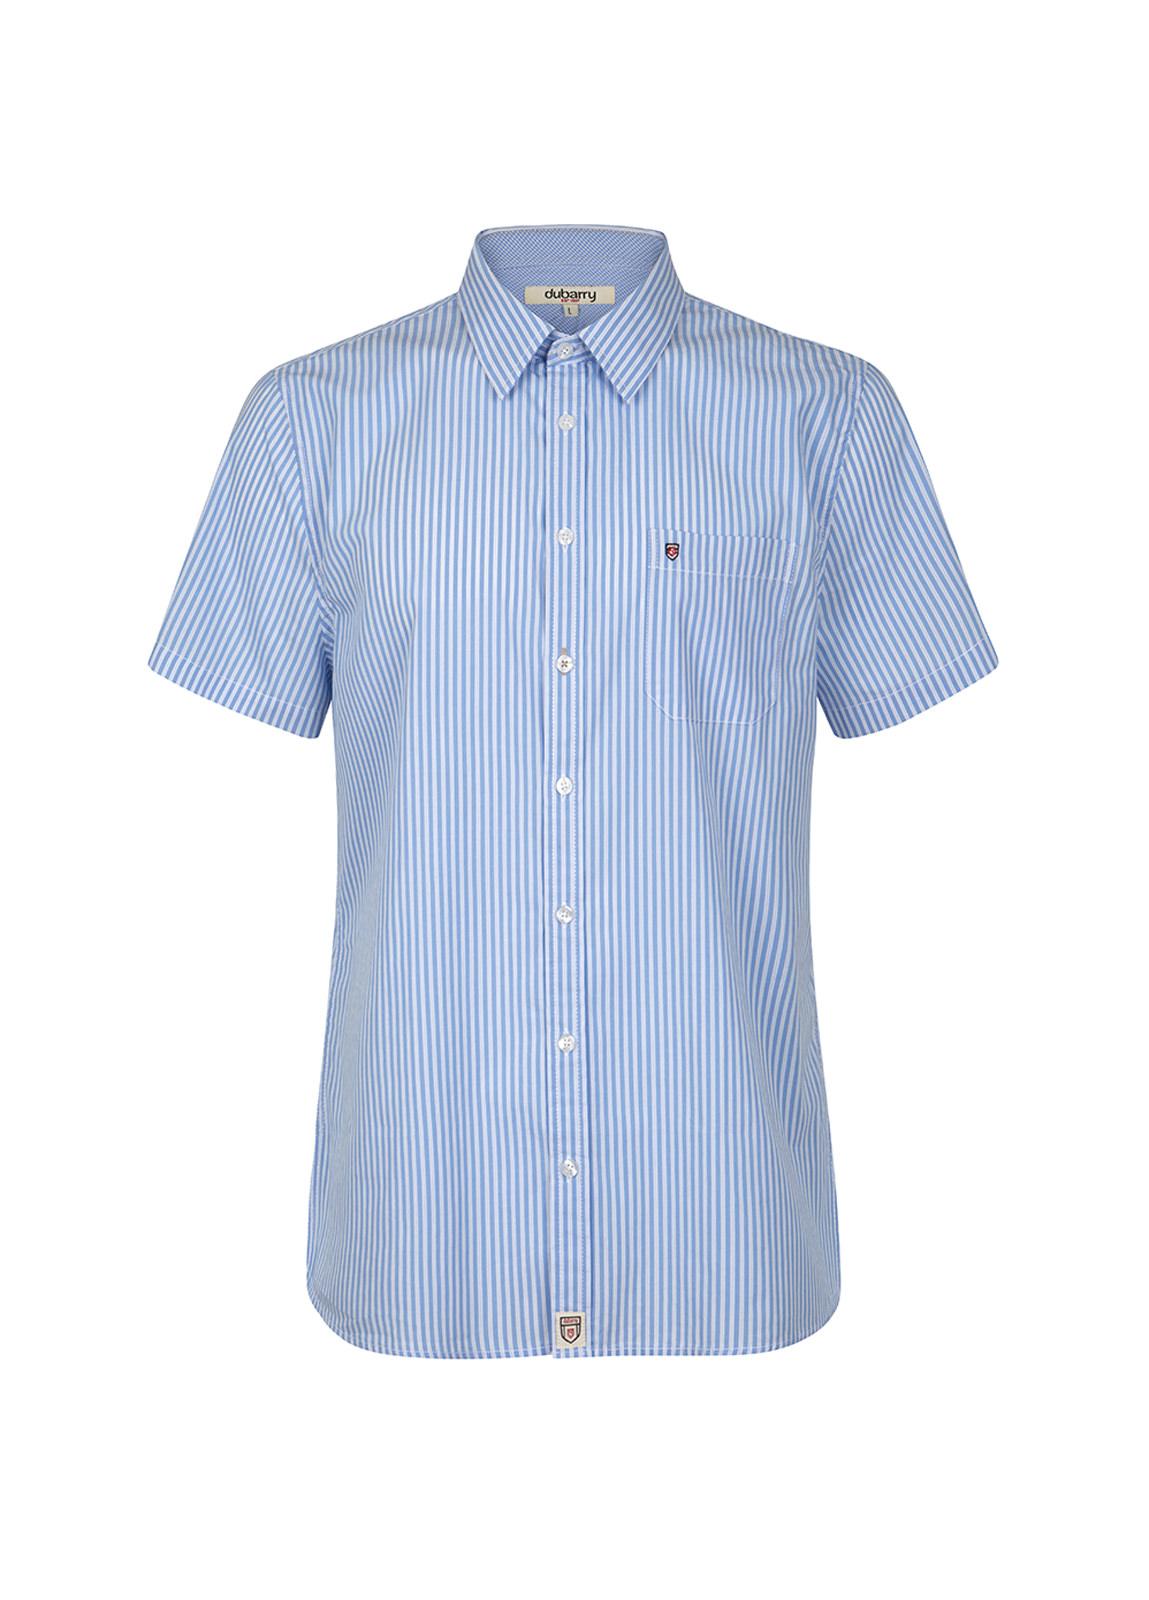 Dubarry_Blackrock Short-Sleeved Striped Shirt - Blue Multi_Image_2